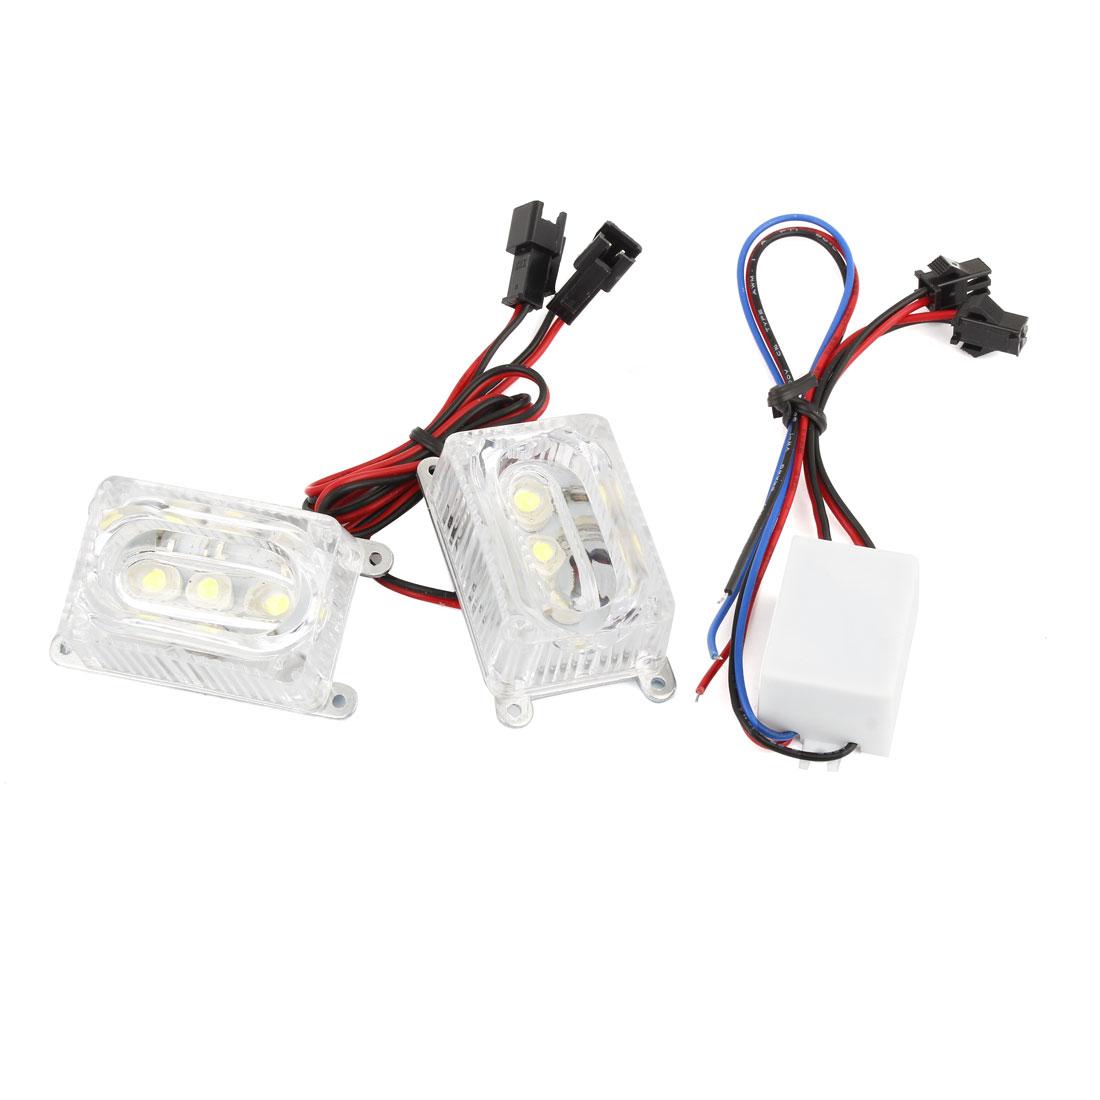 2 Pcs Universal White 3 LED Cuboid Shape Decor Light Brake Lamp for Motorcycle